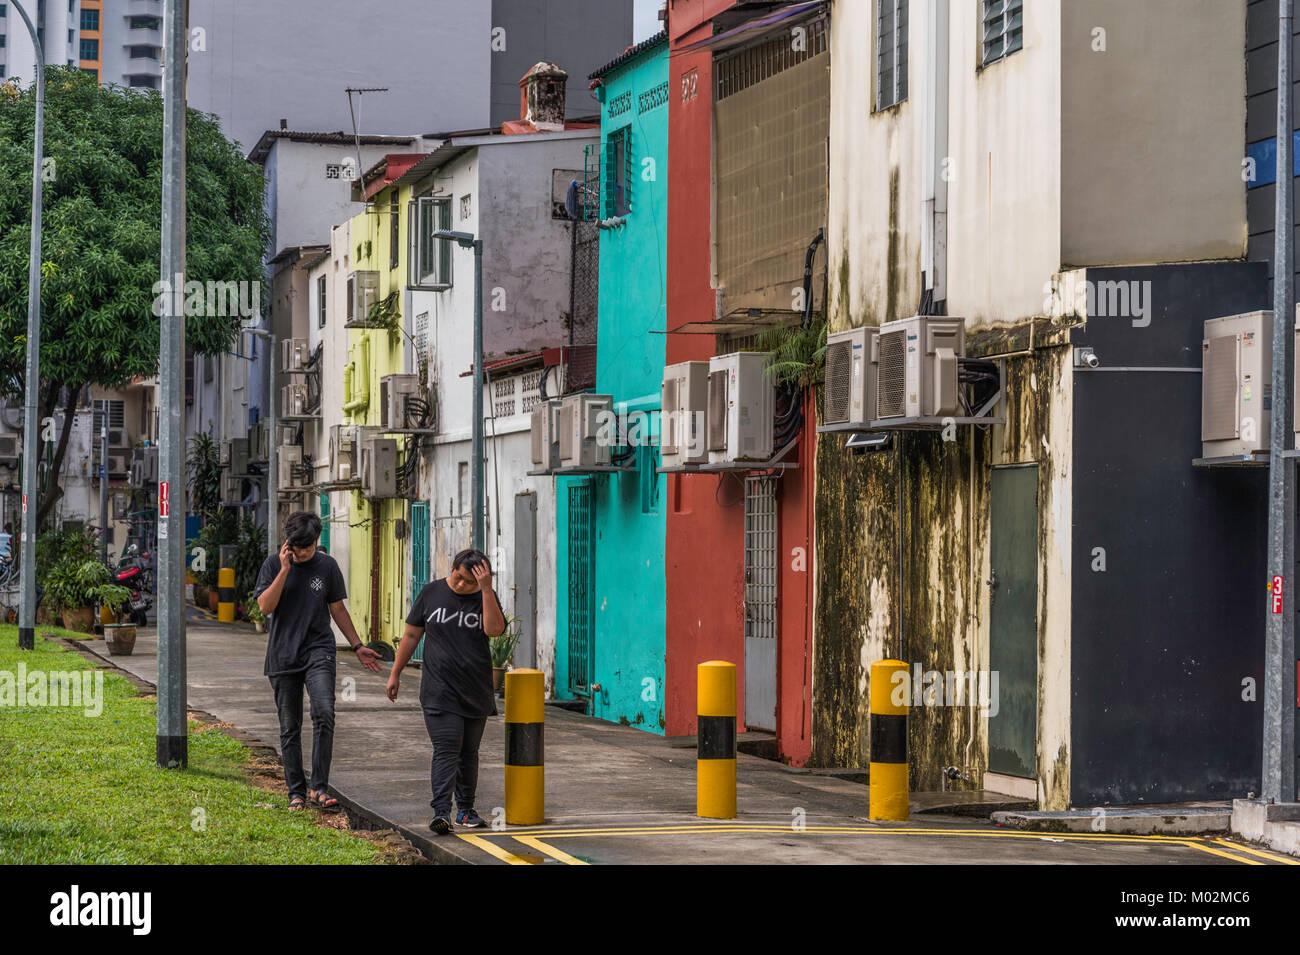 La gente en las calles de Little India, Singapur Imagen De Stock